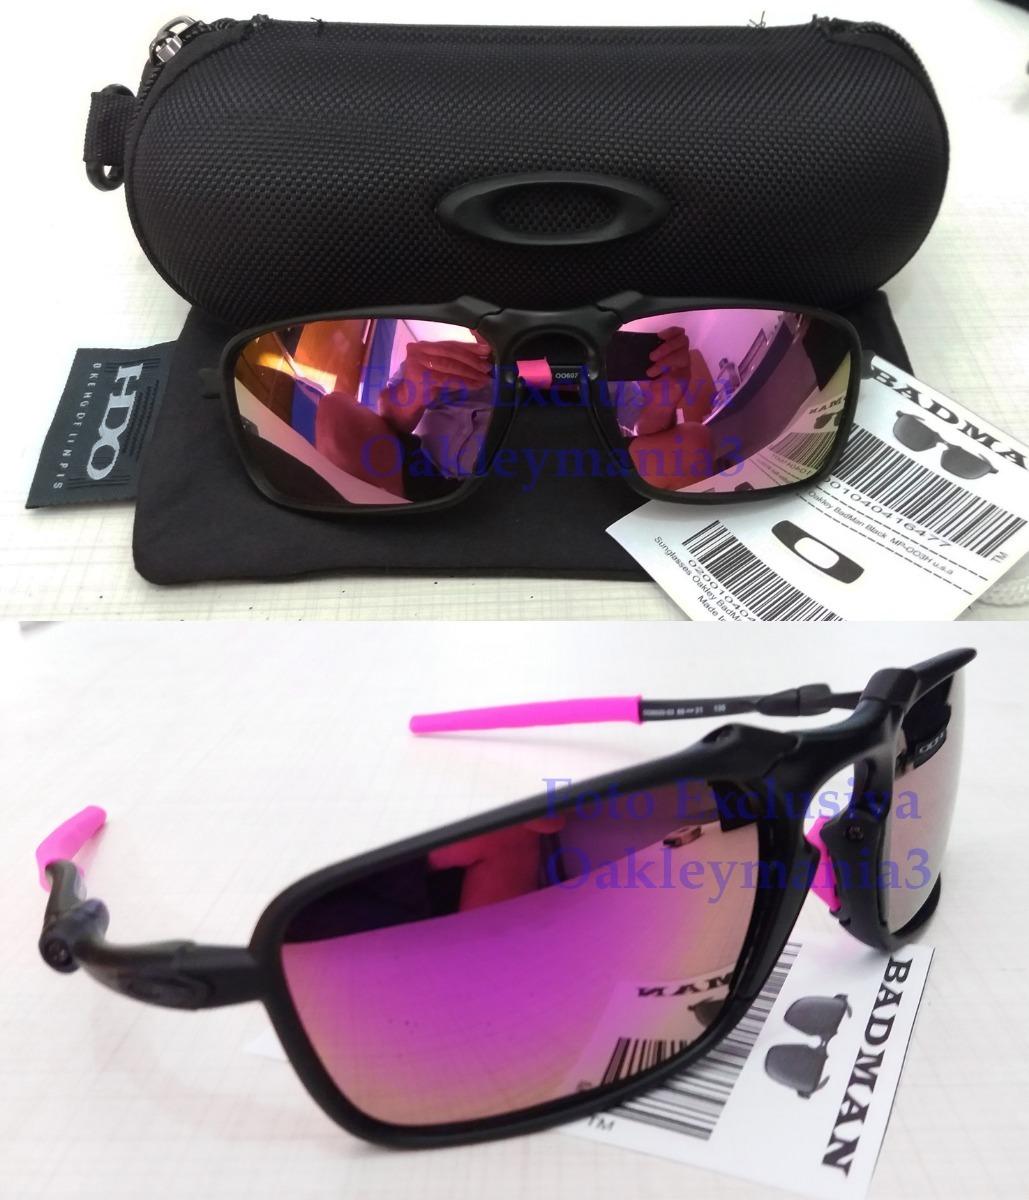 f3bfb55be6eb8 Oakley Badman Black Fosco Lente Rosa Pink Polarized+case - R  185,00 ...